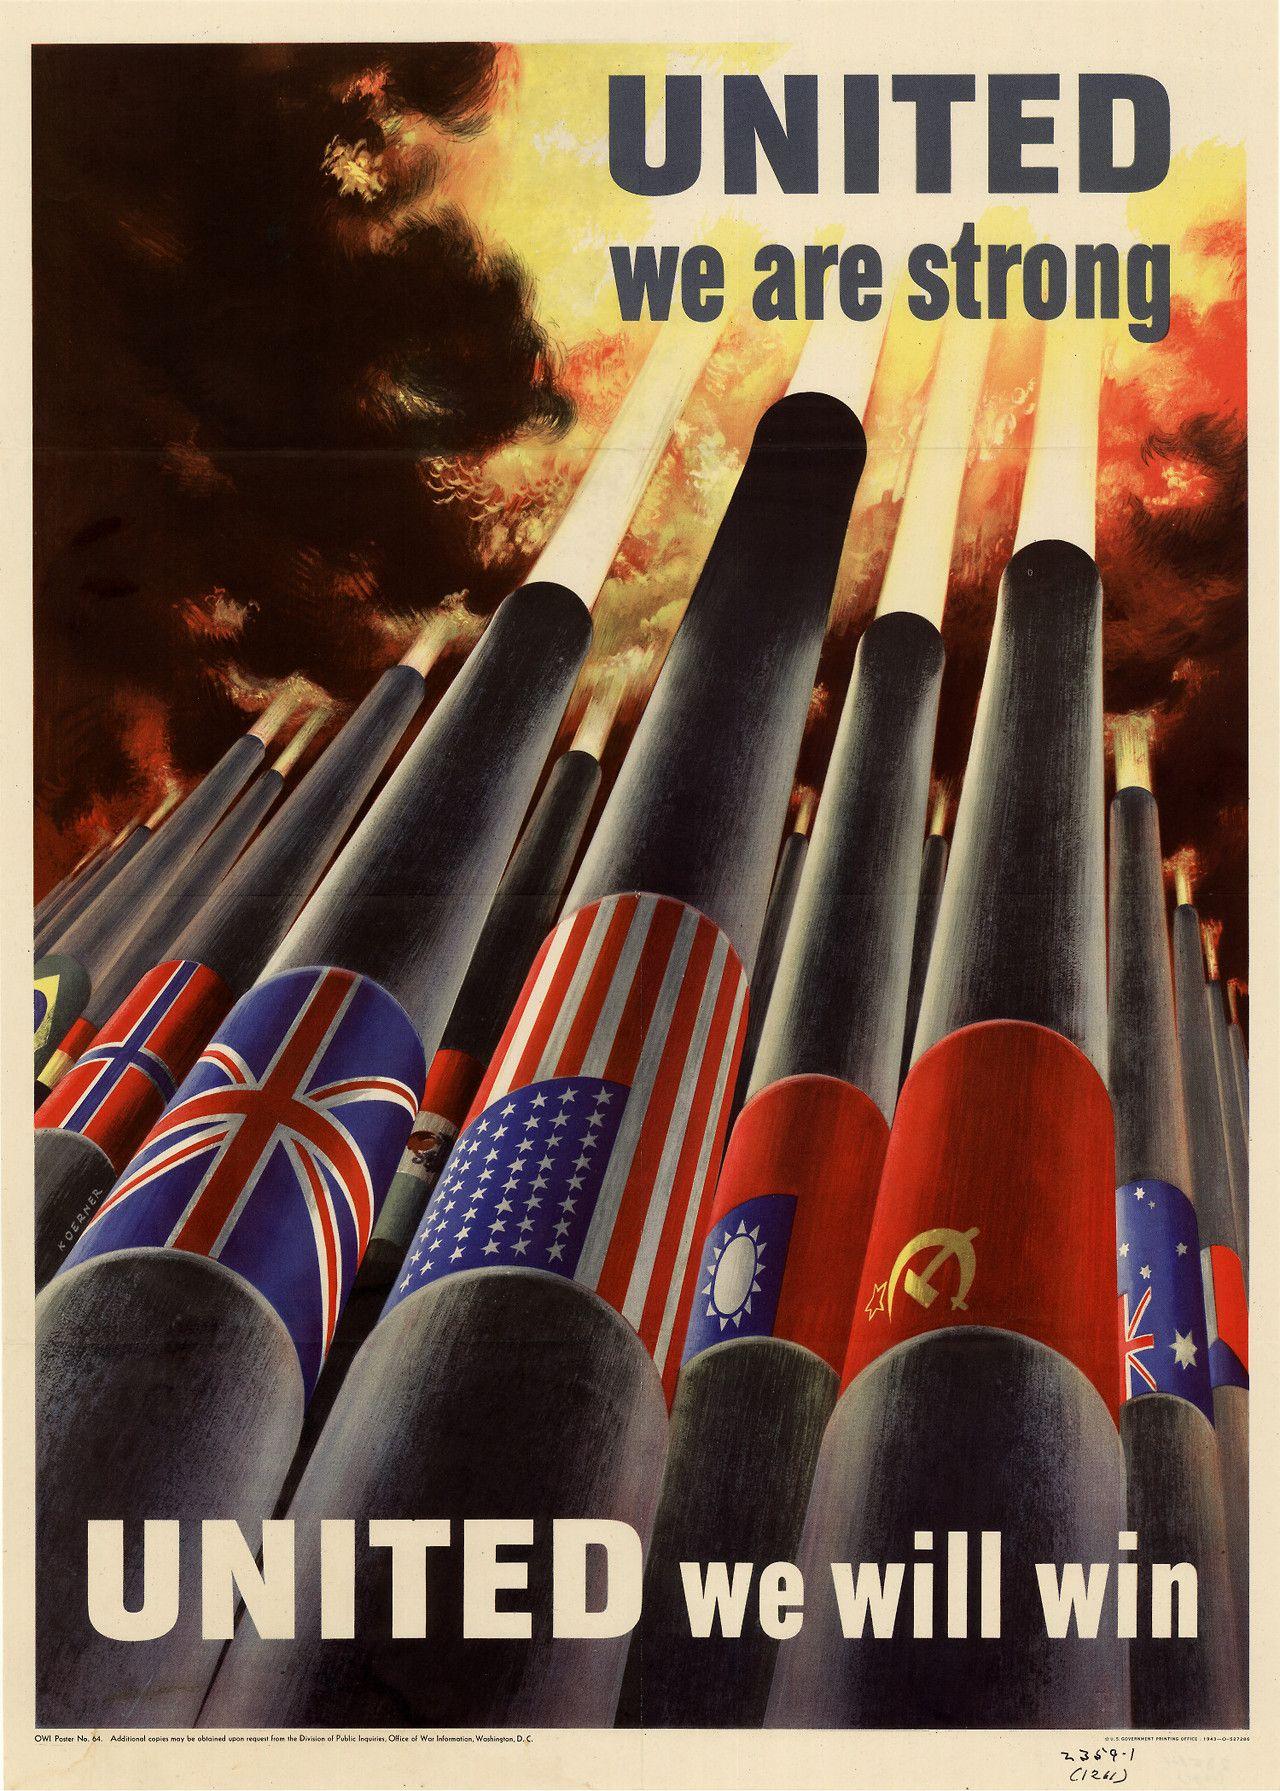 american ww2 alliance propaganda poster 1943 ww2